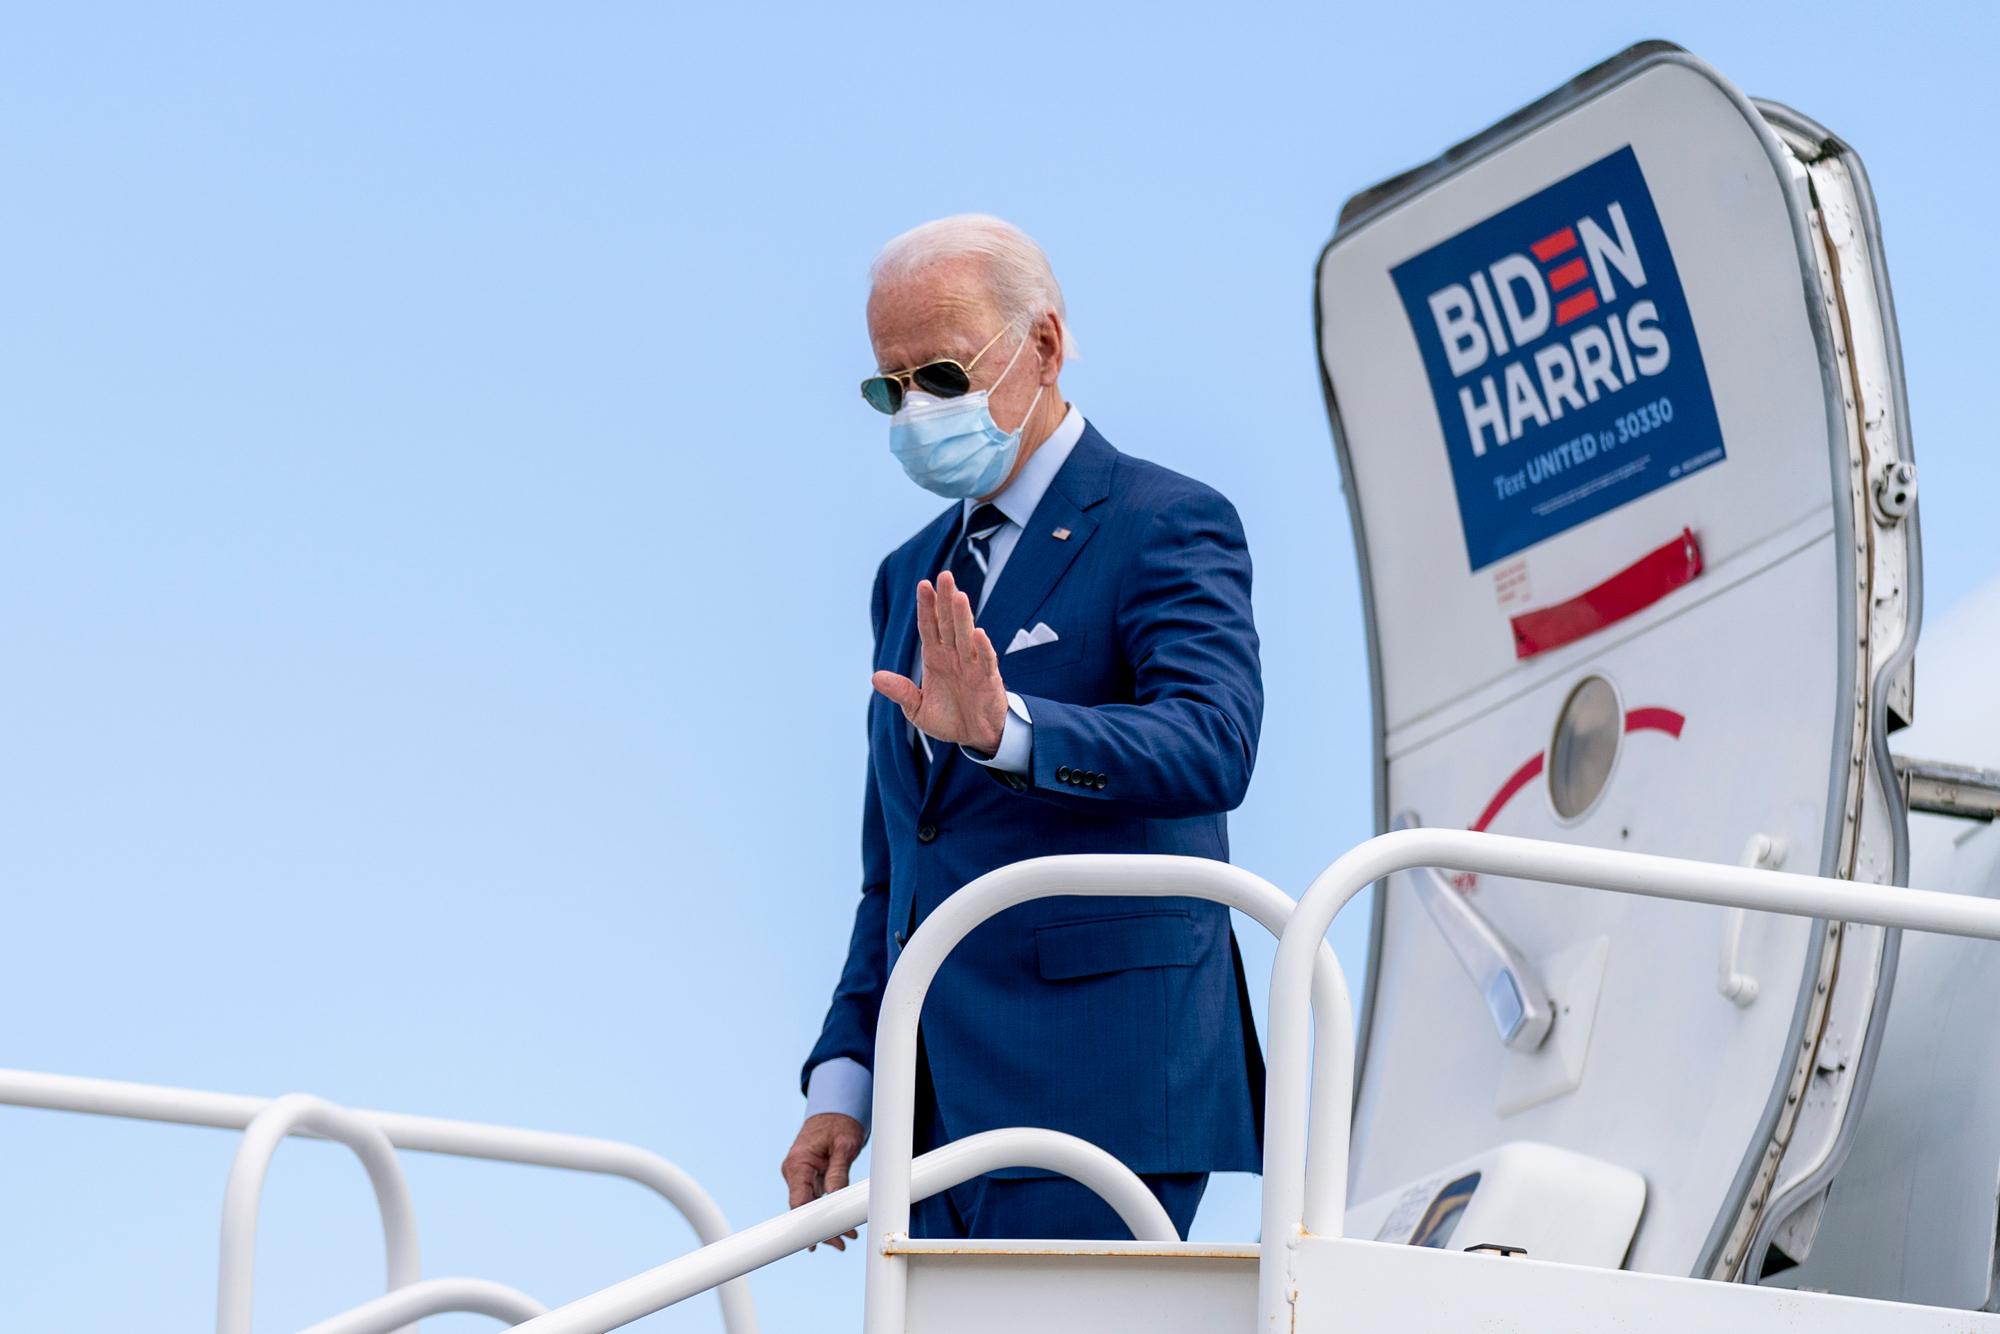 Democratic presidential candidate Joe Biden arrives at Fort Lauderdale-Hollywood International Airport in Fort Lauderdale, Florida, on October 29.